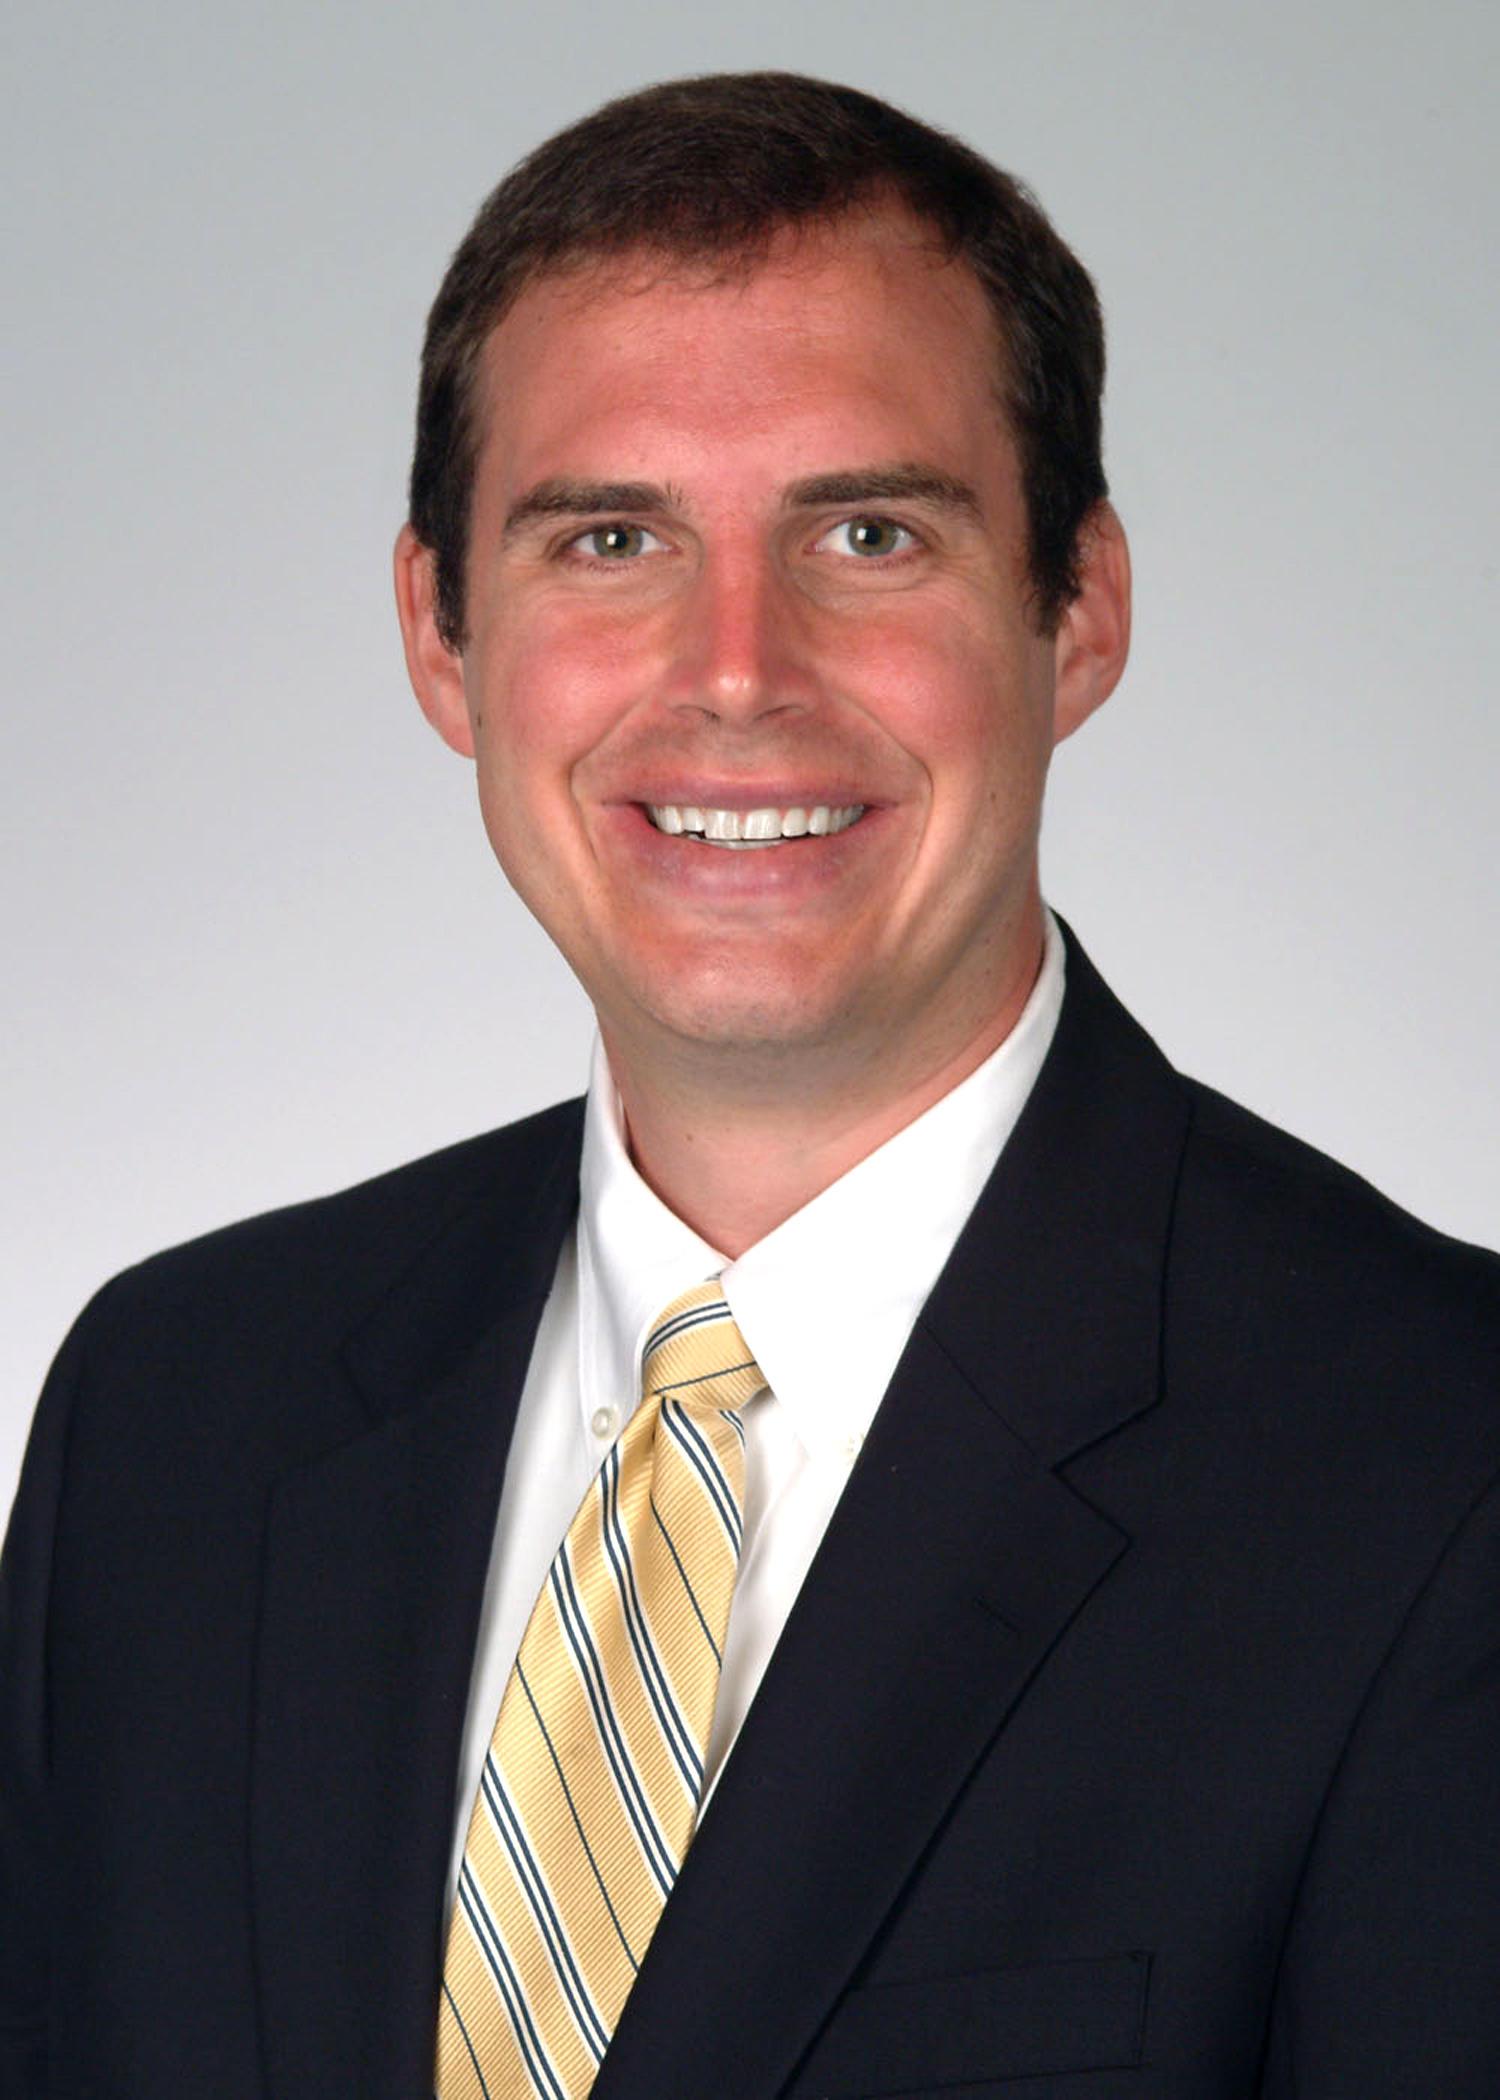 George N Magrath, IIi MD